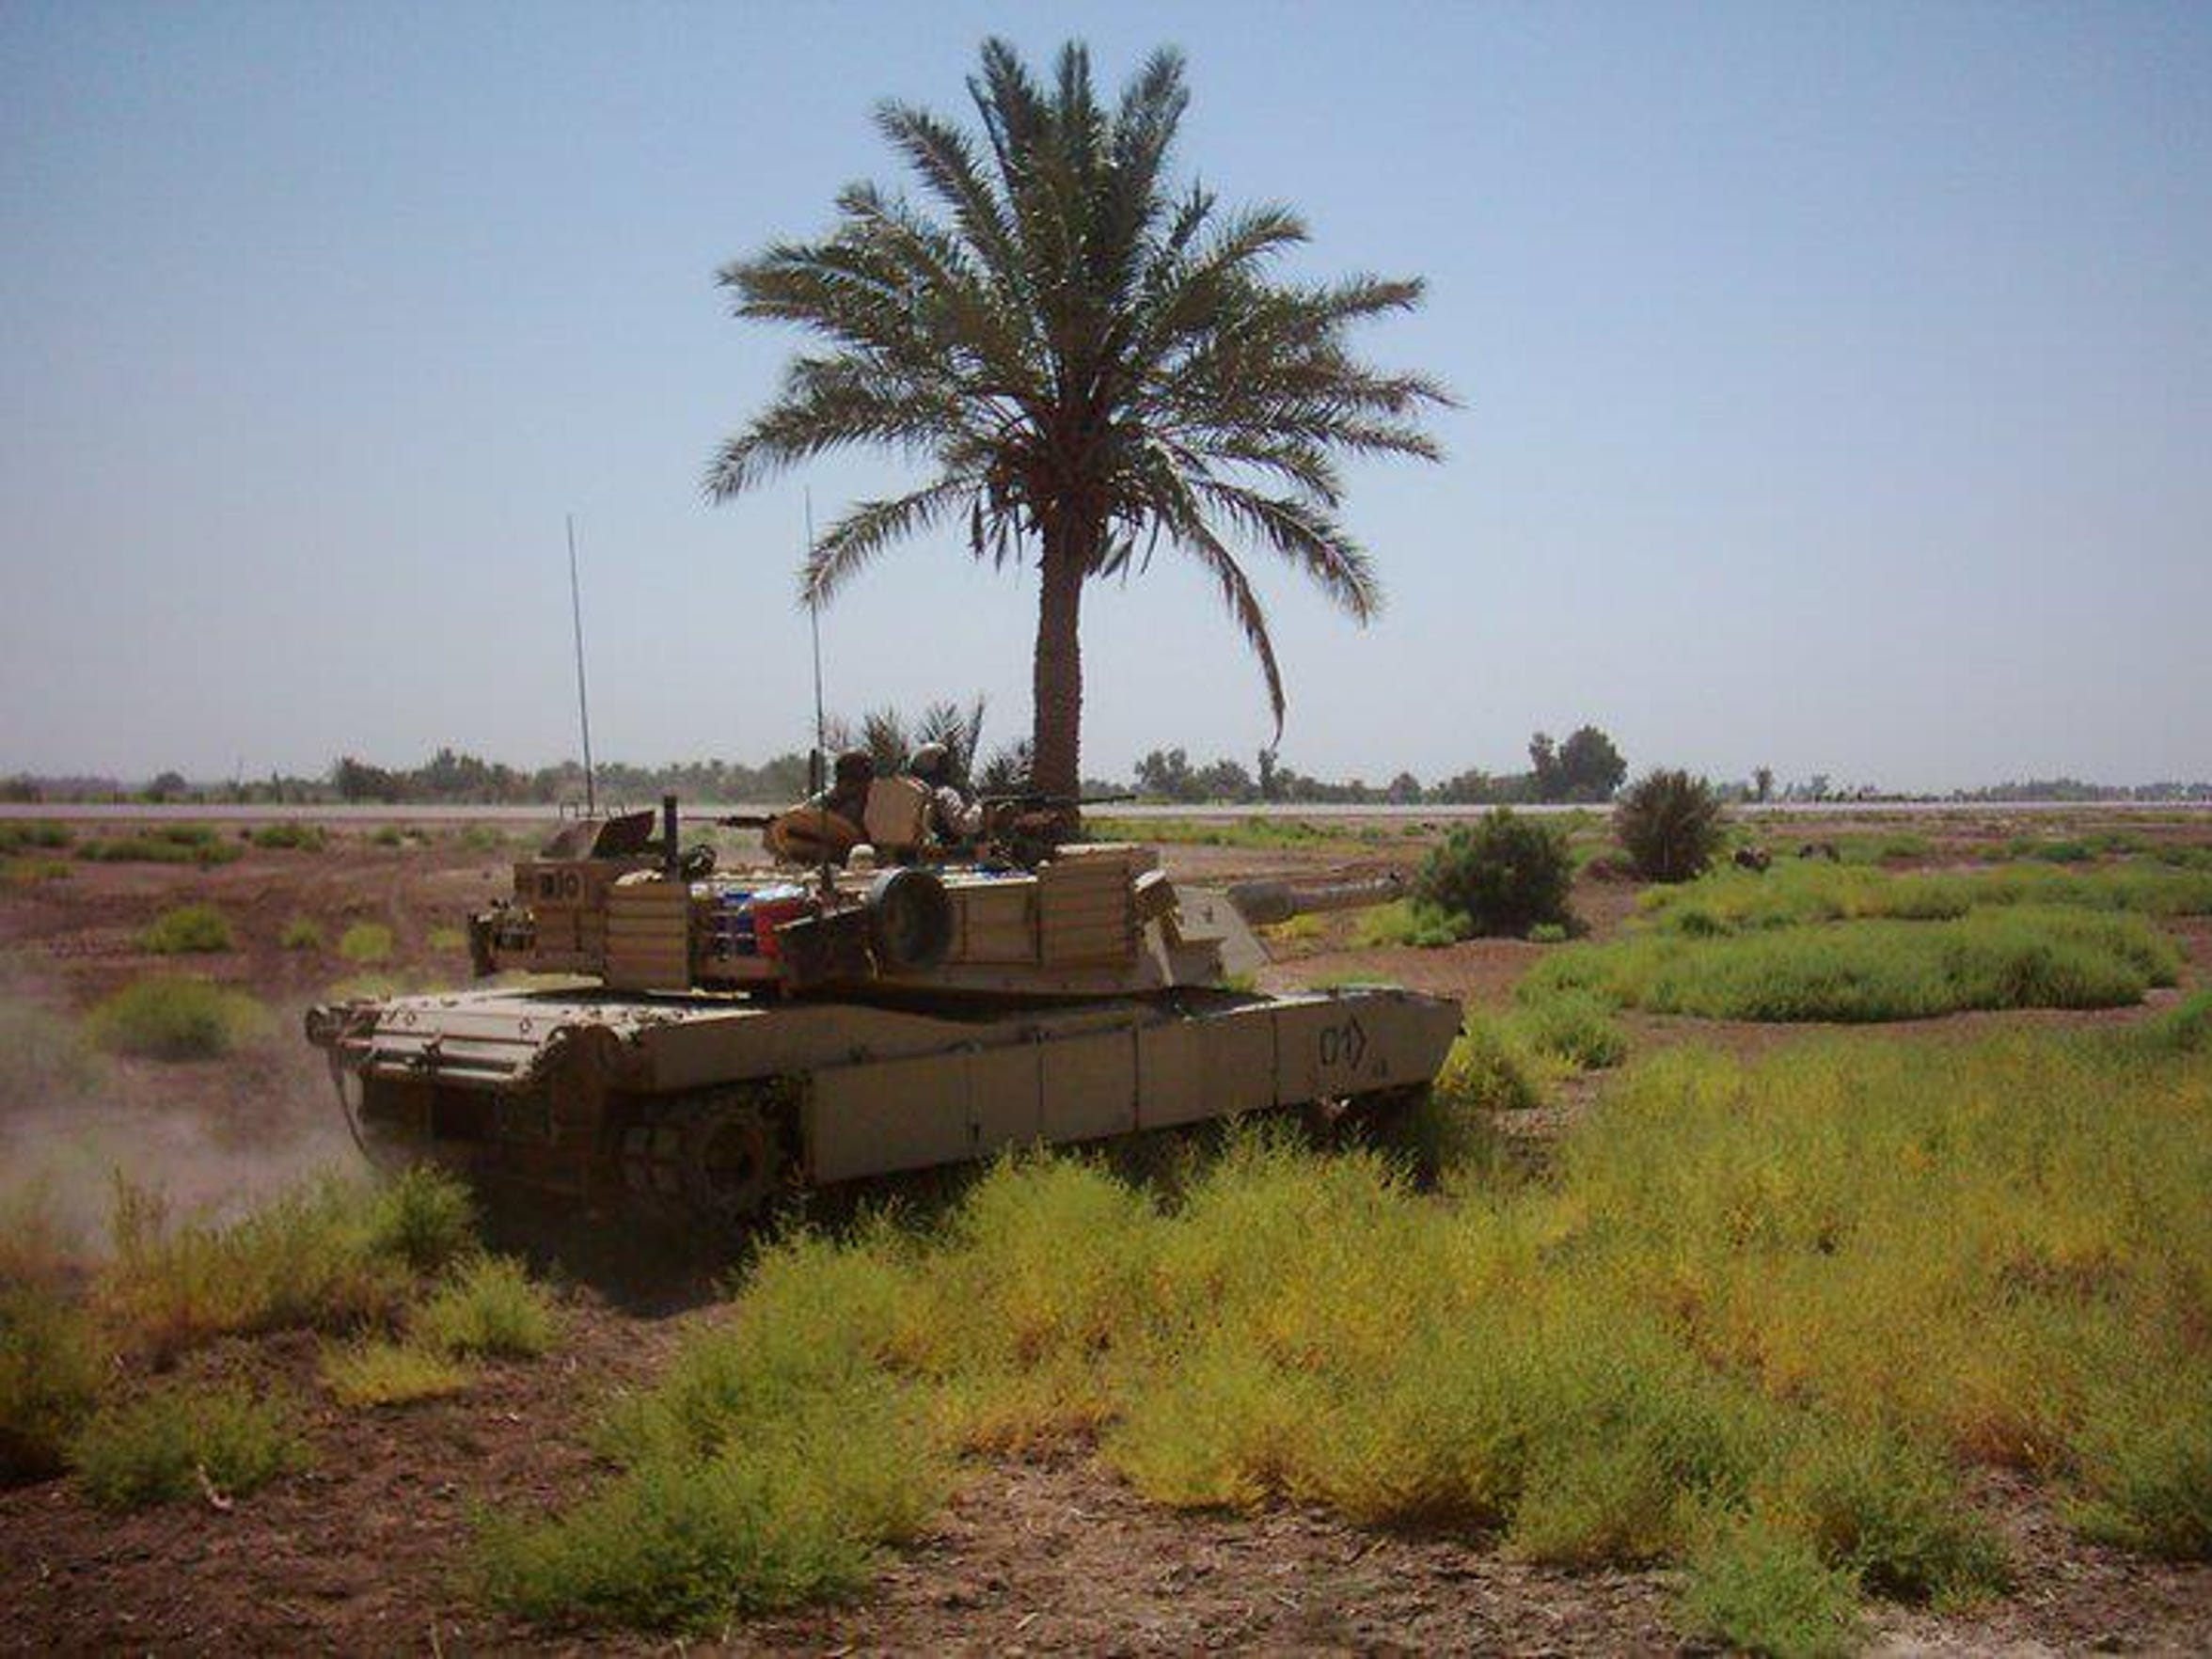 An Abrams M1A1 tank in Iraq.